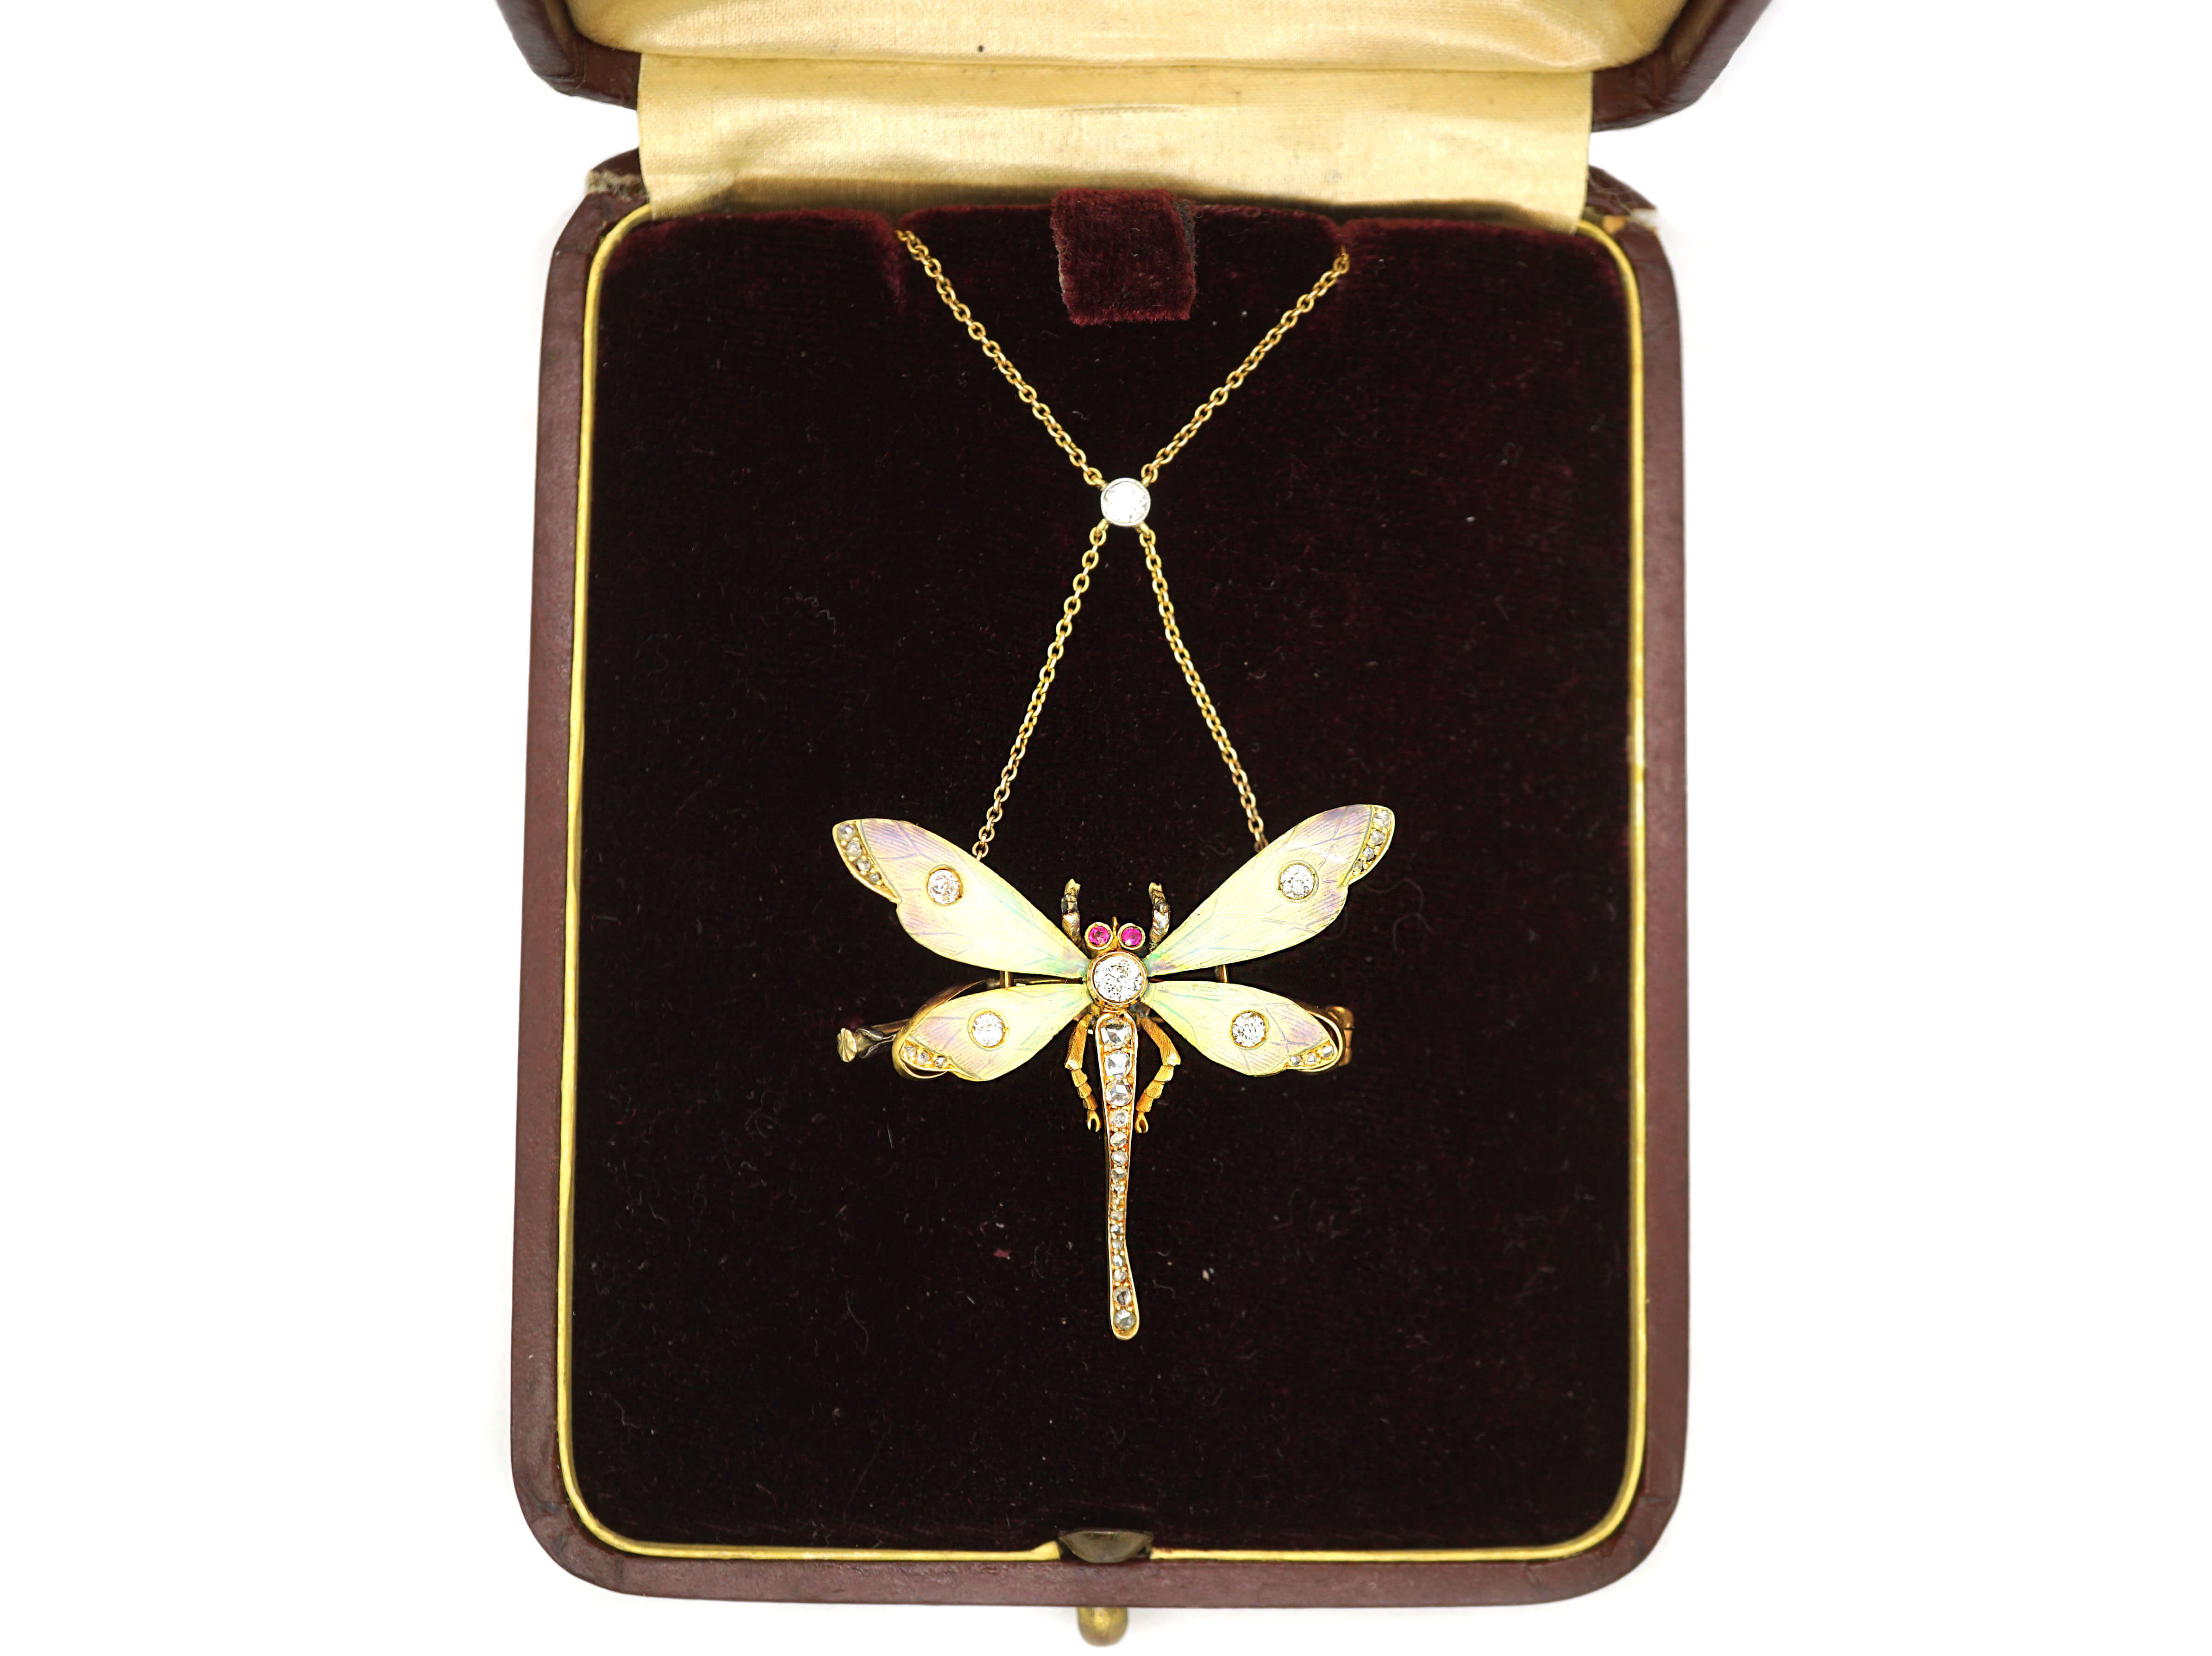 Art Nouveau Dragonfly Pendant on Chain in Original Case